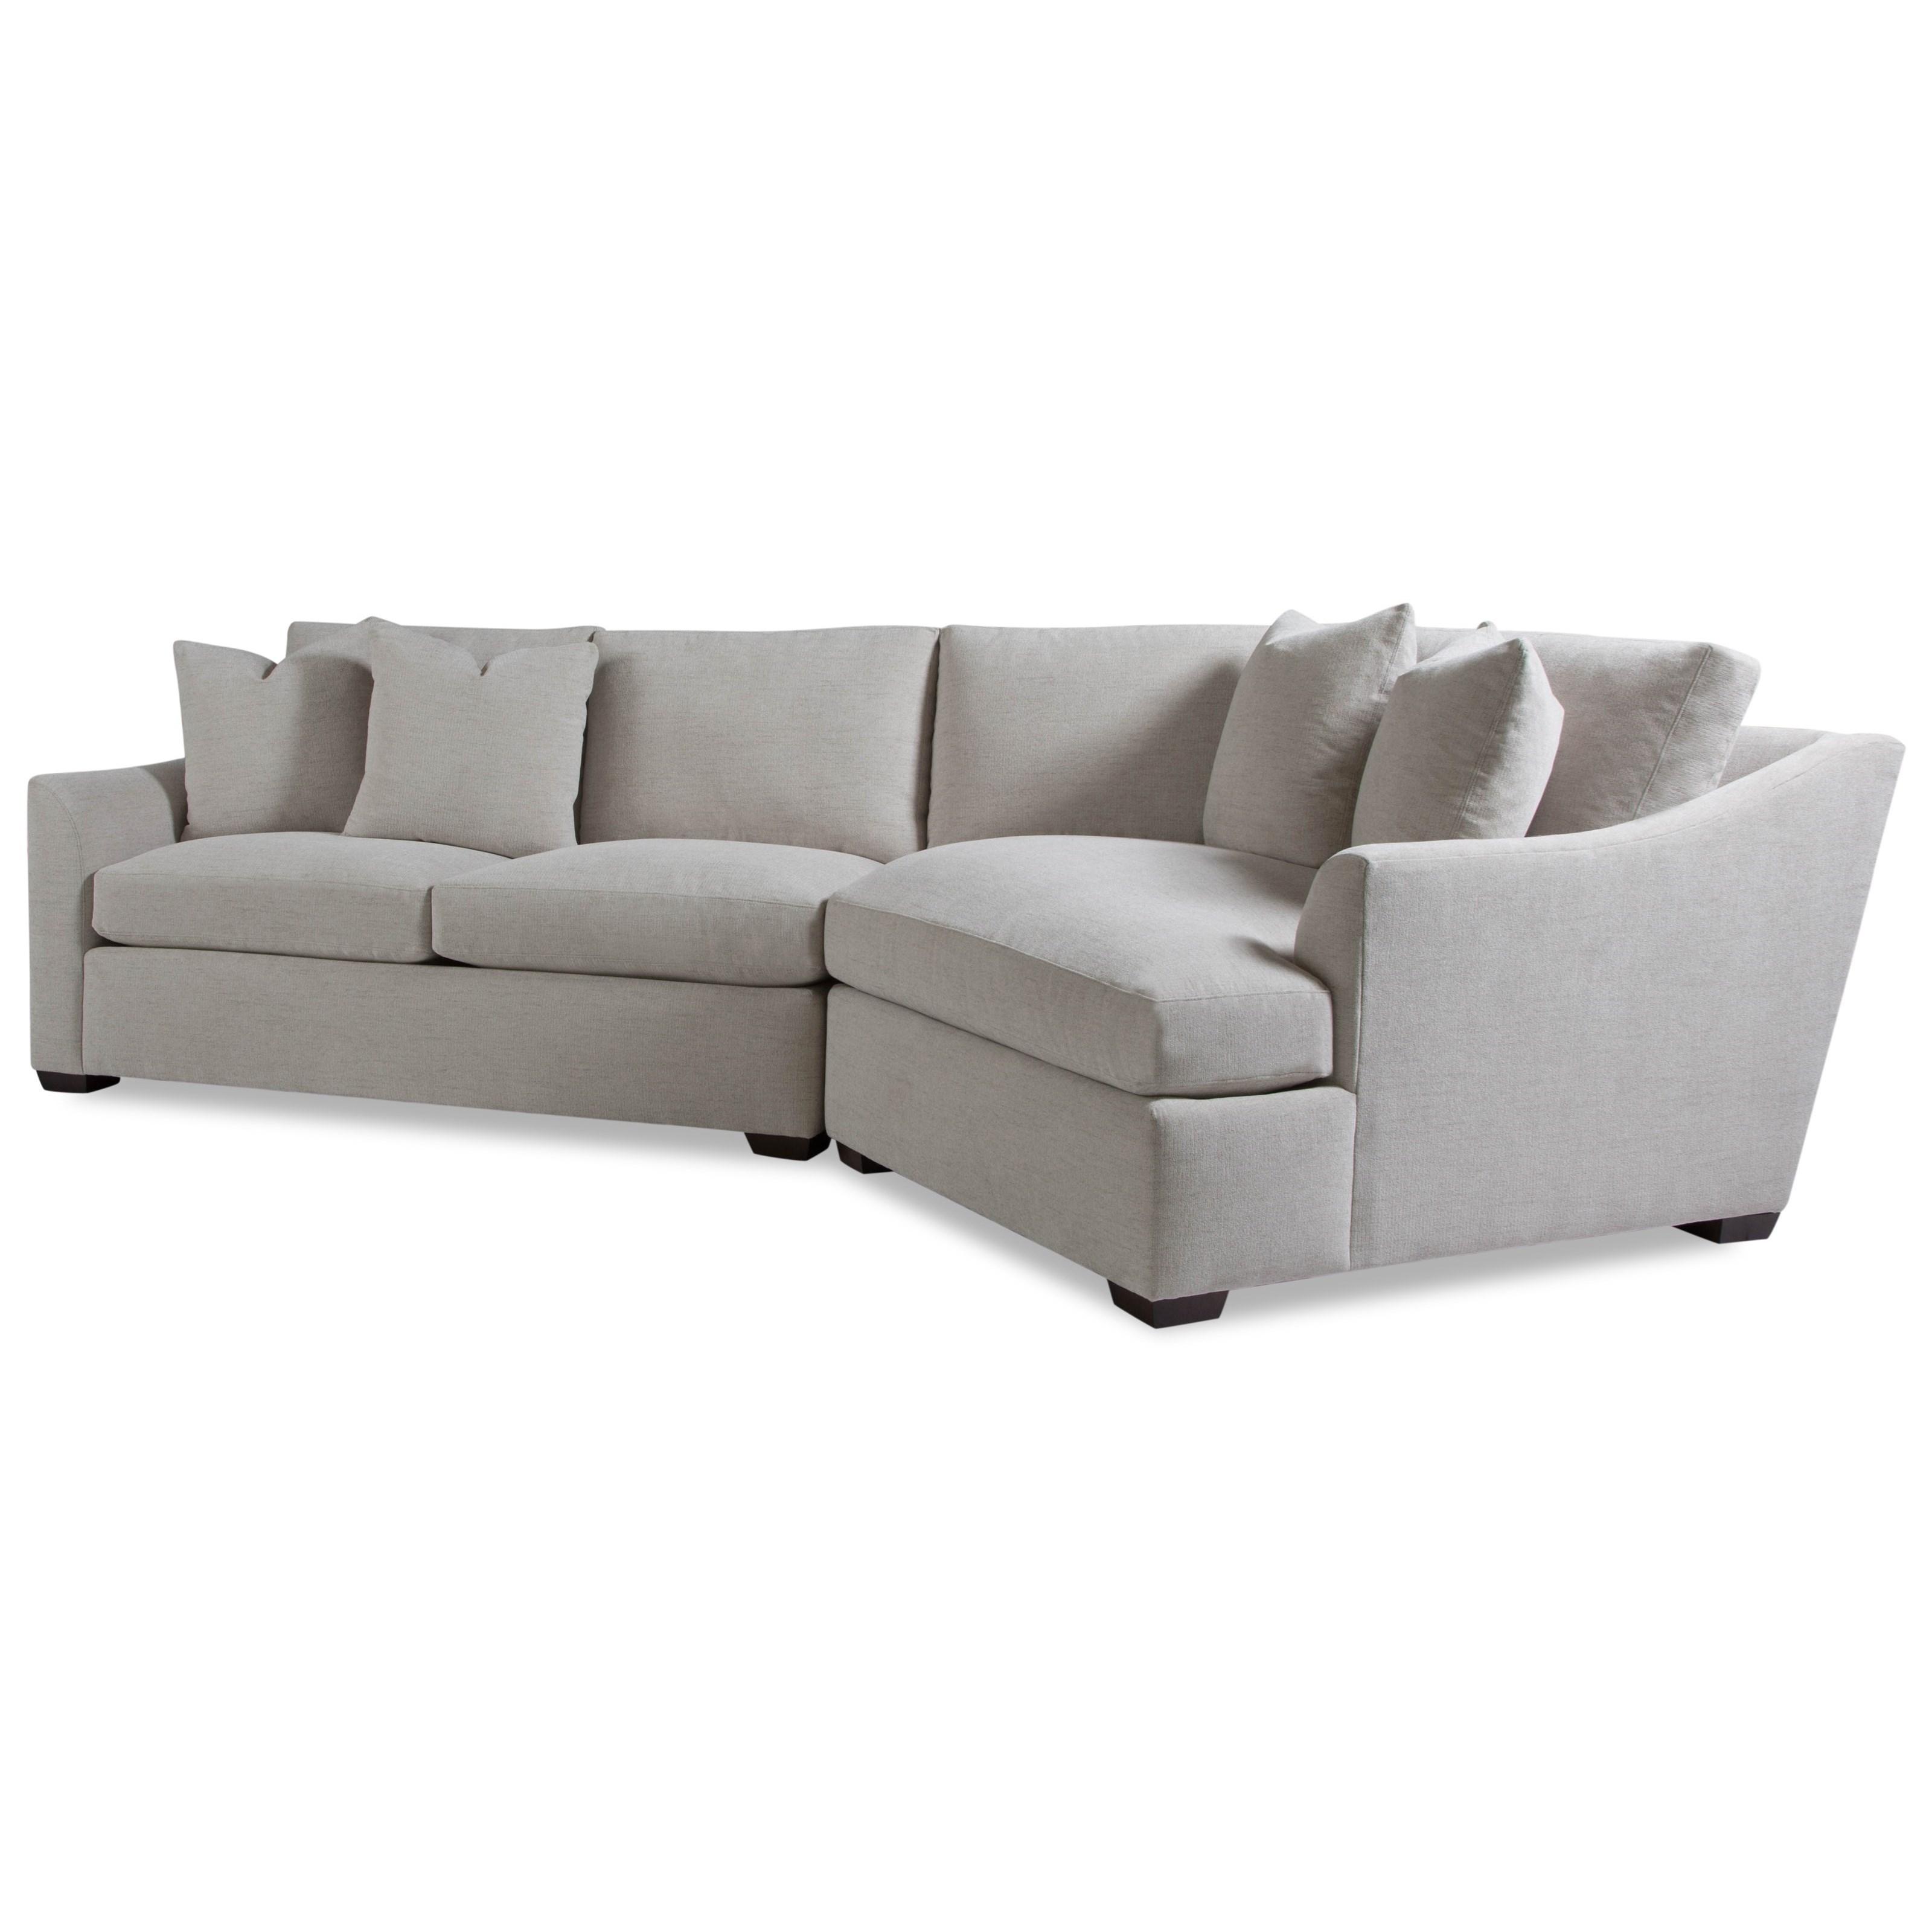 huntington sectional sofa natalie habitat house plush two piece with raf